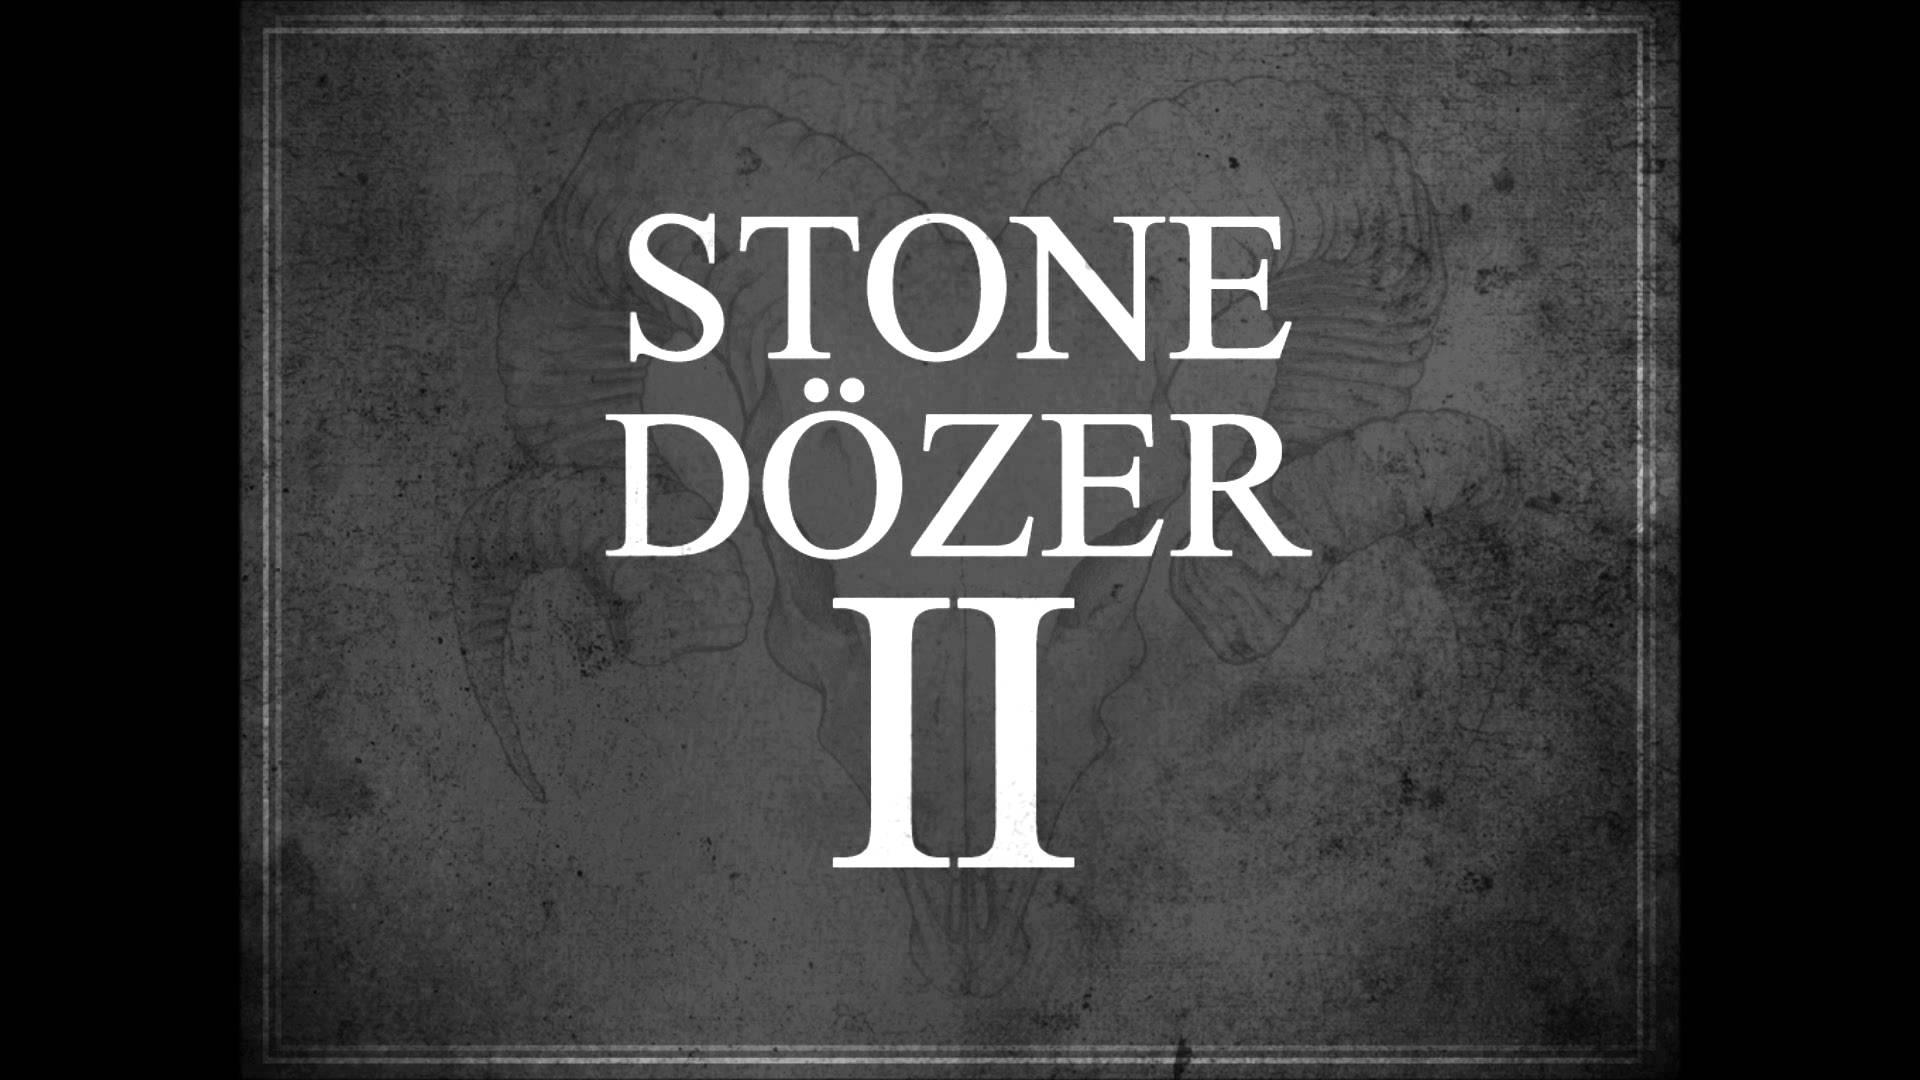 Stone dozer photo